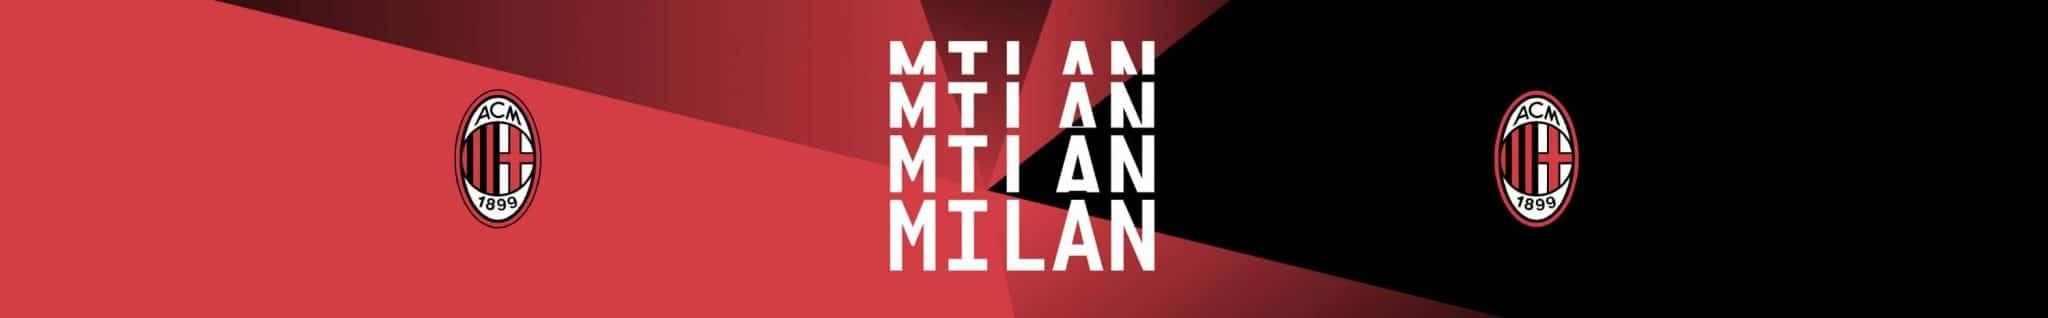 Banner Orizzontale Milan